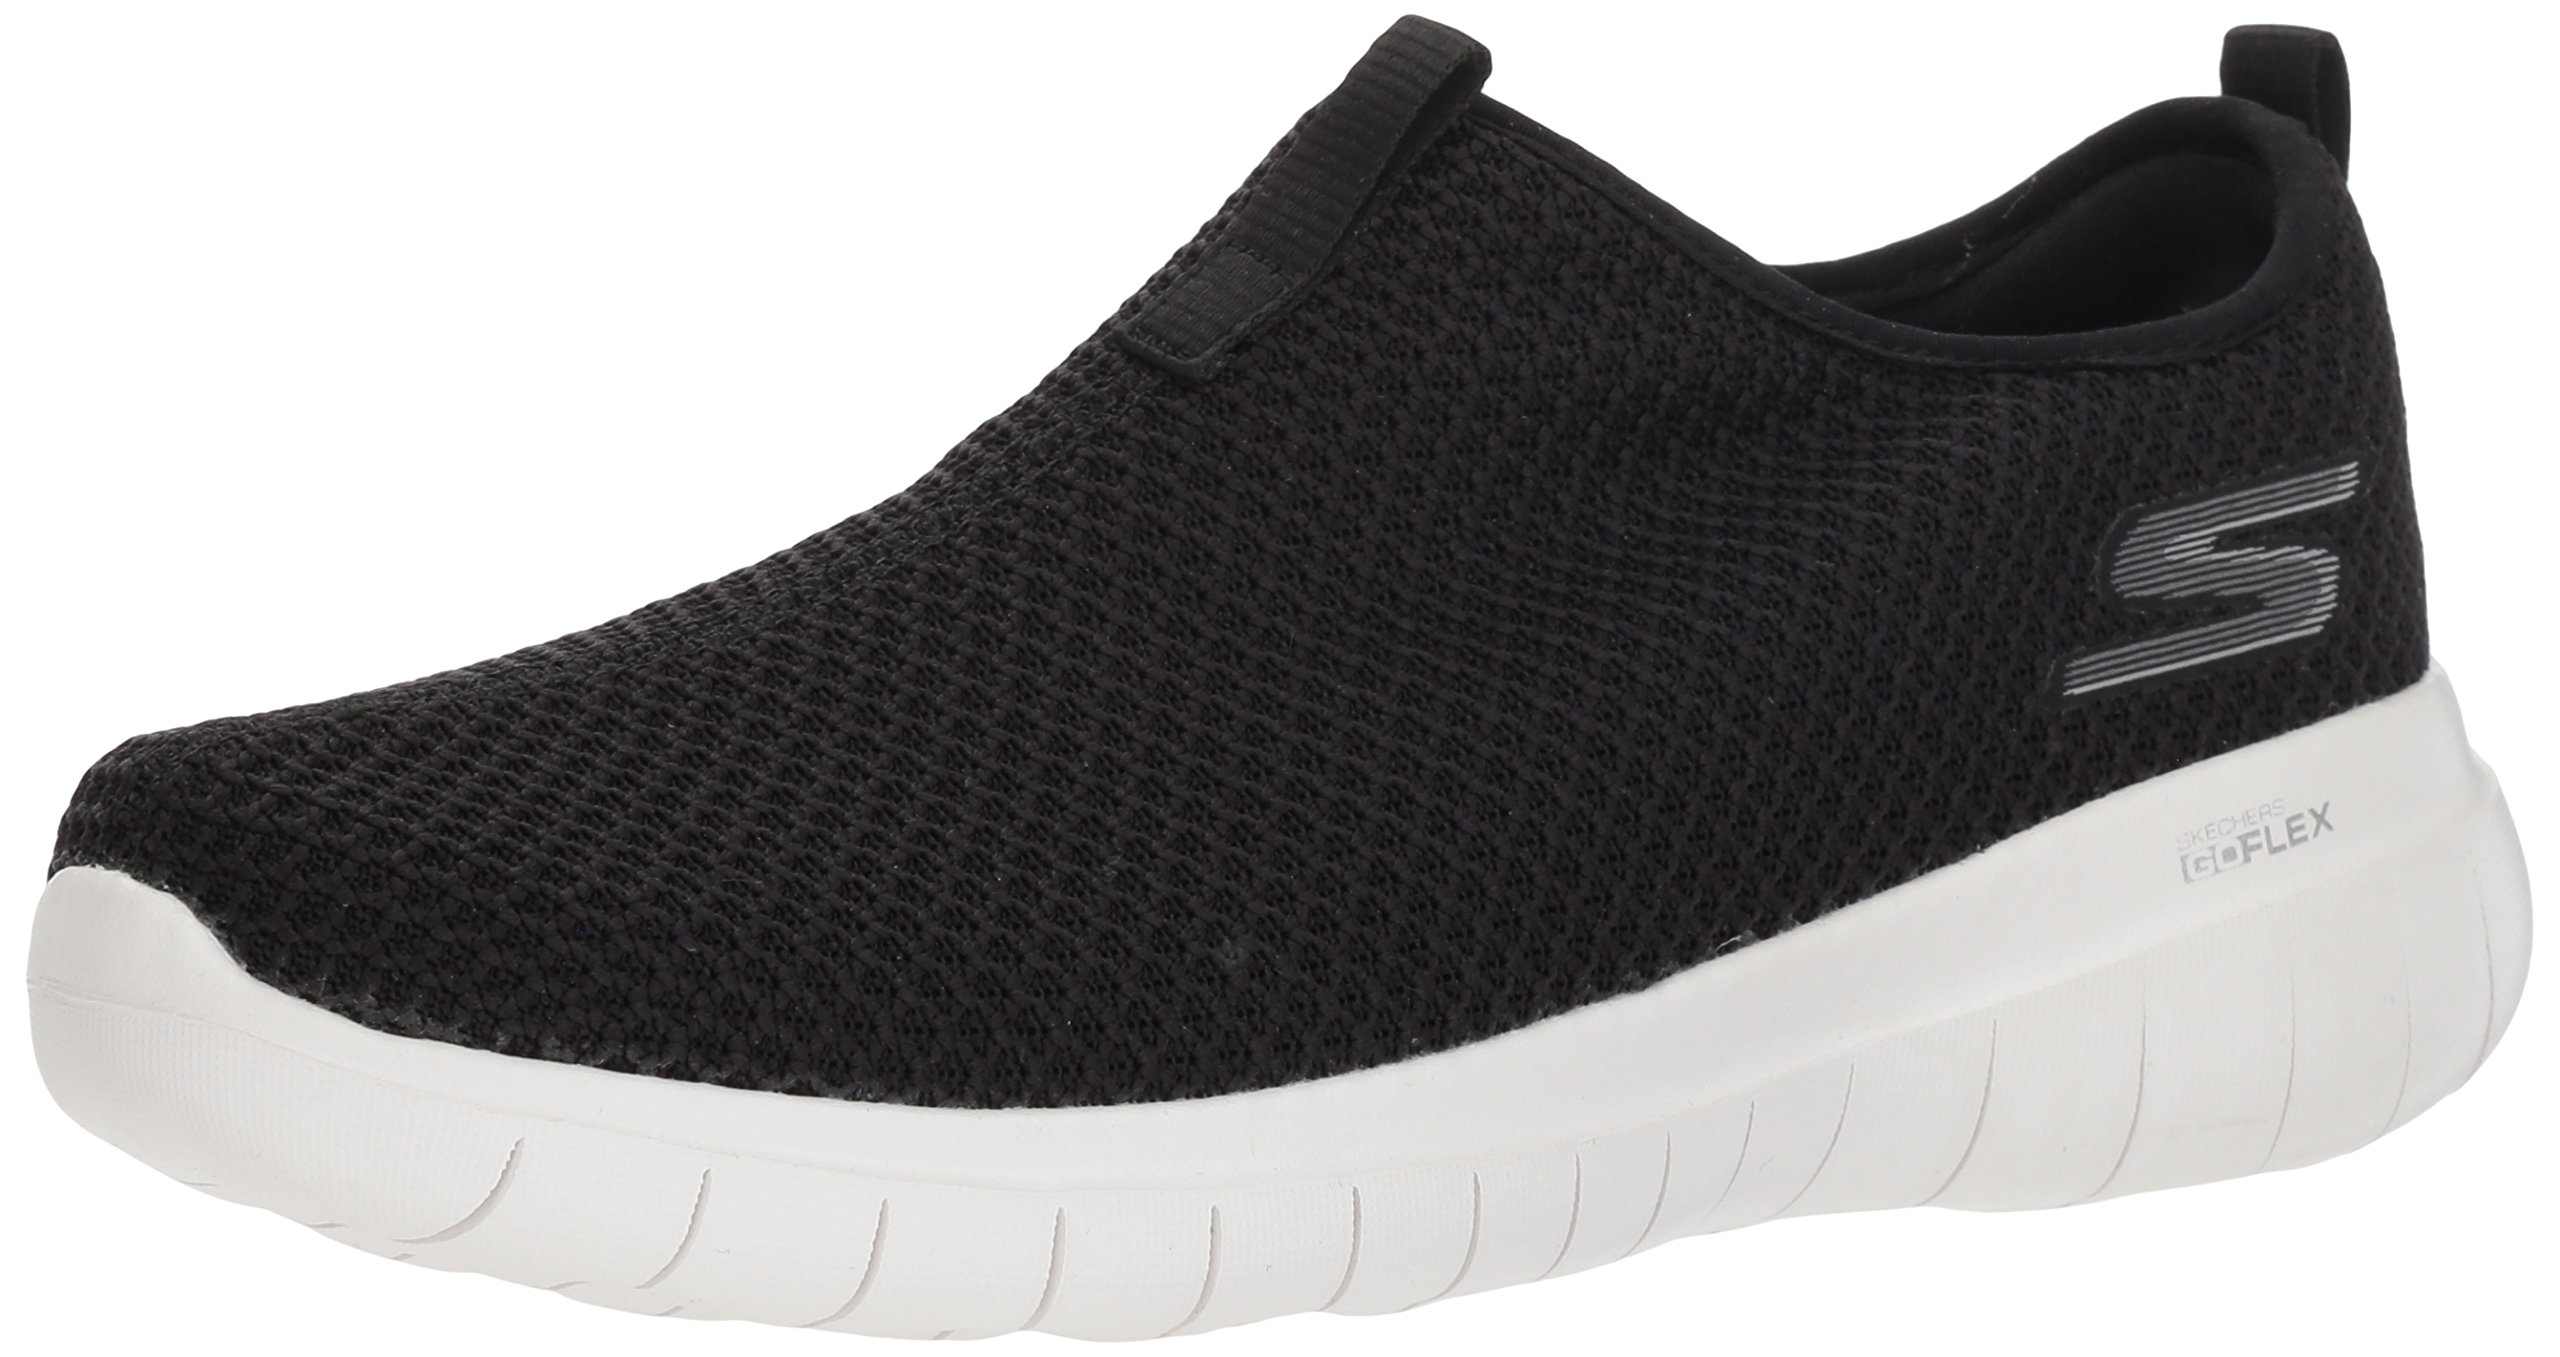 Skechers Performance Women's Go Flex Max-Horizon Sneaker,Black/White,5.5 M US